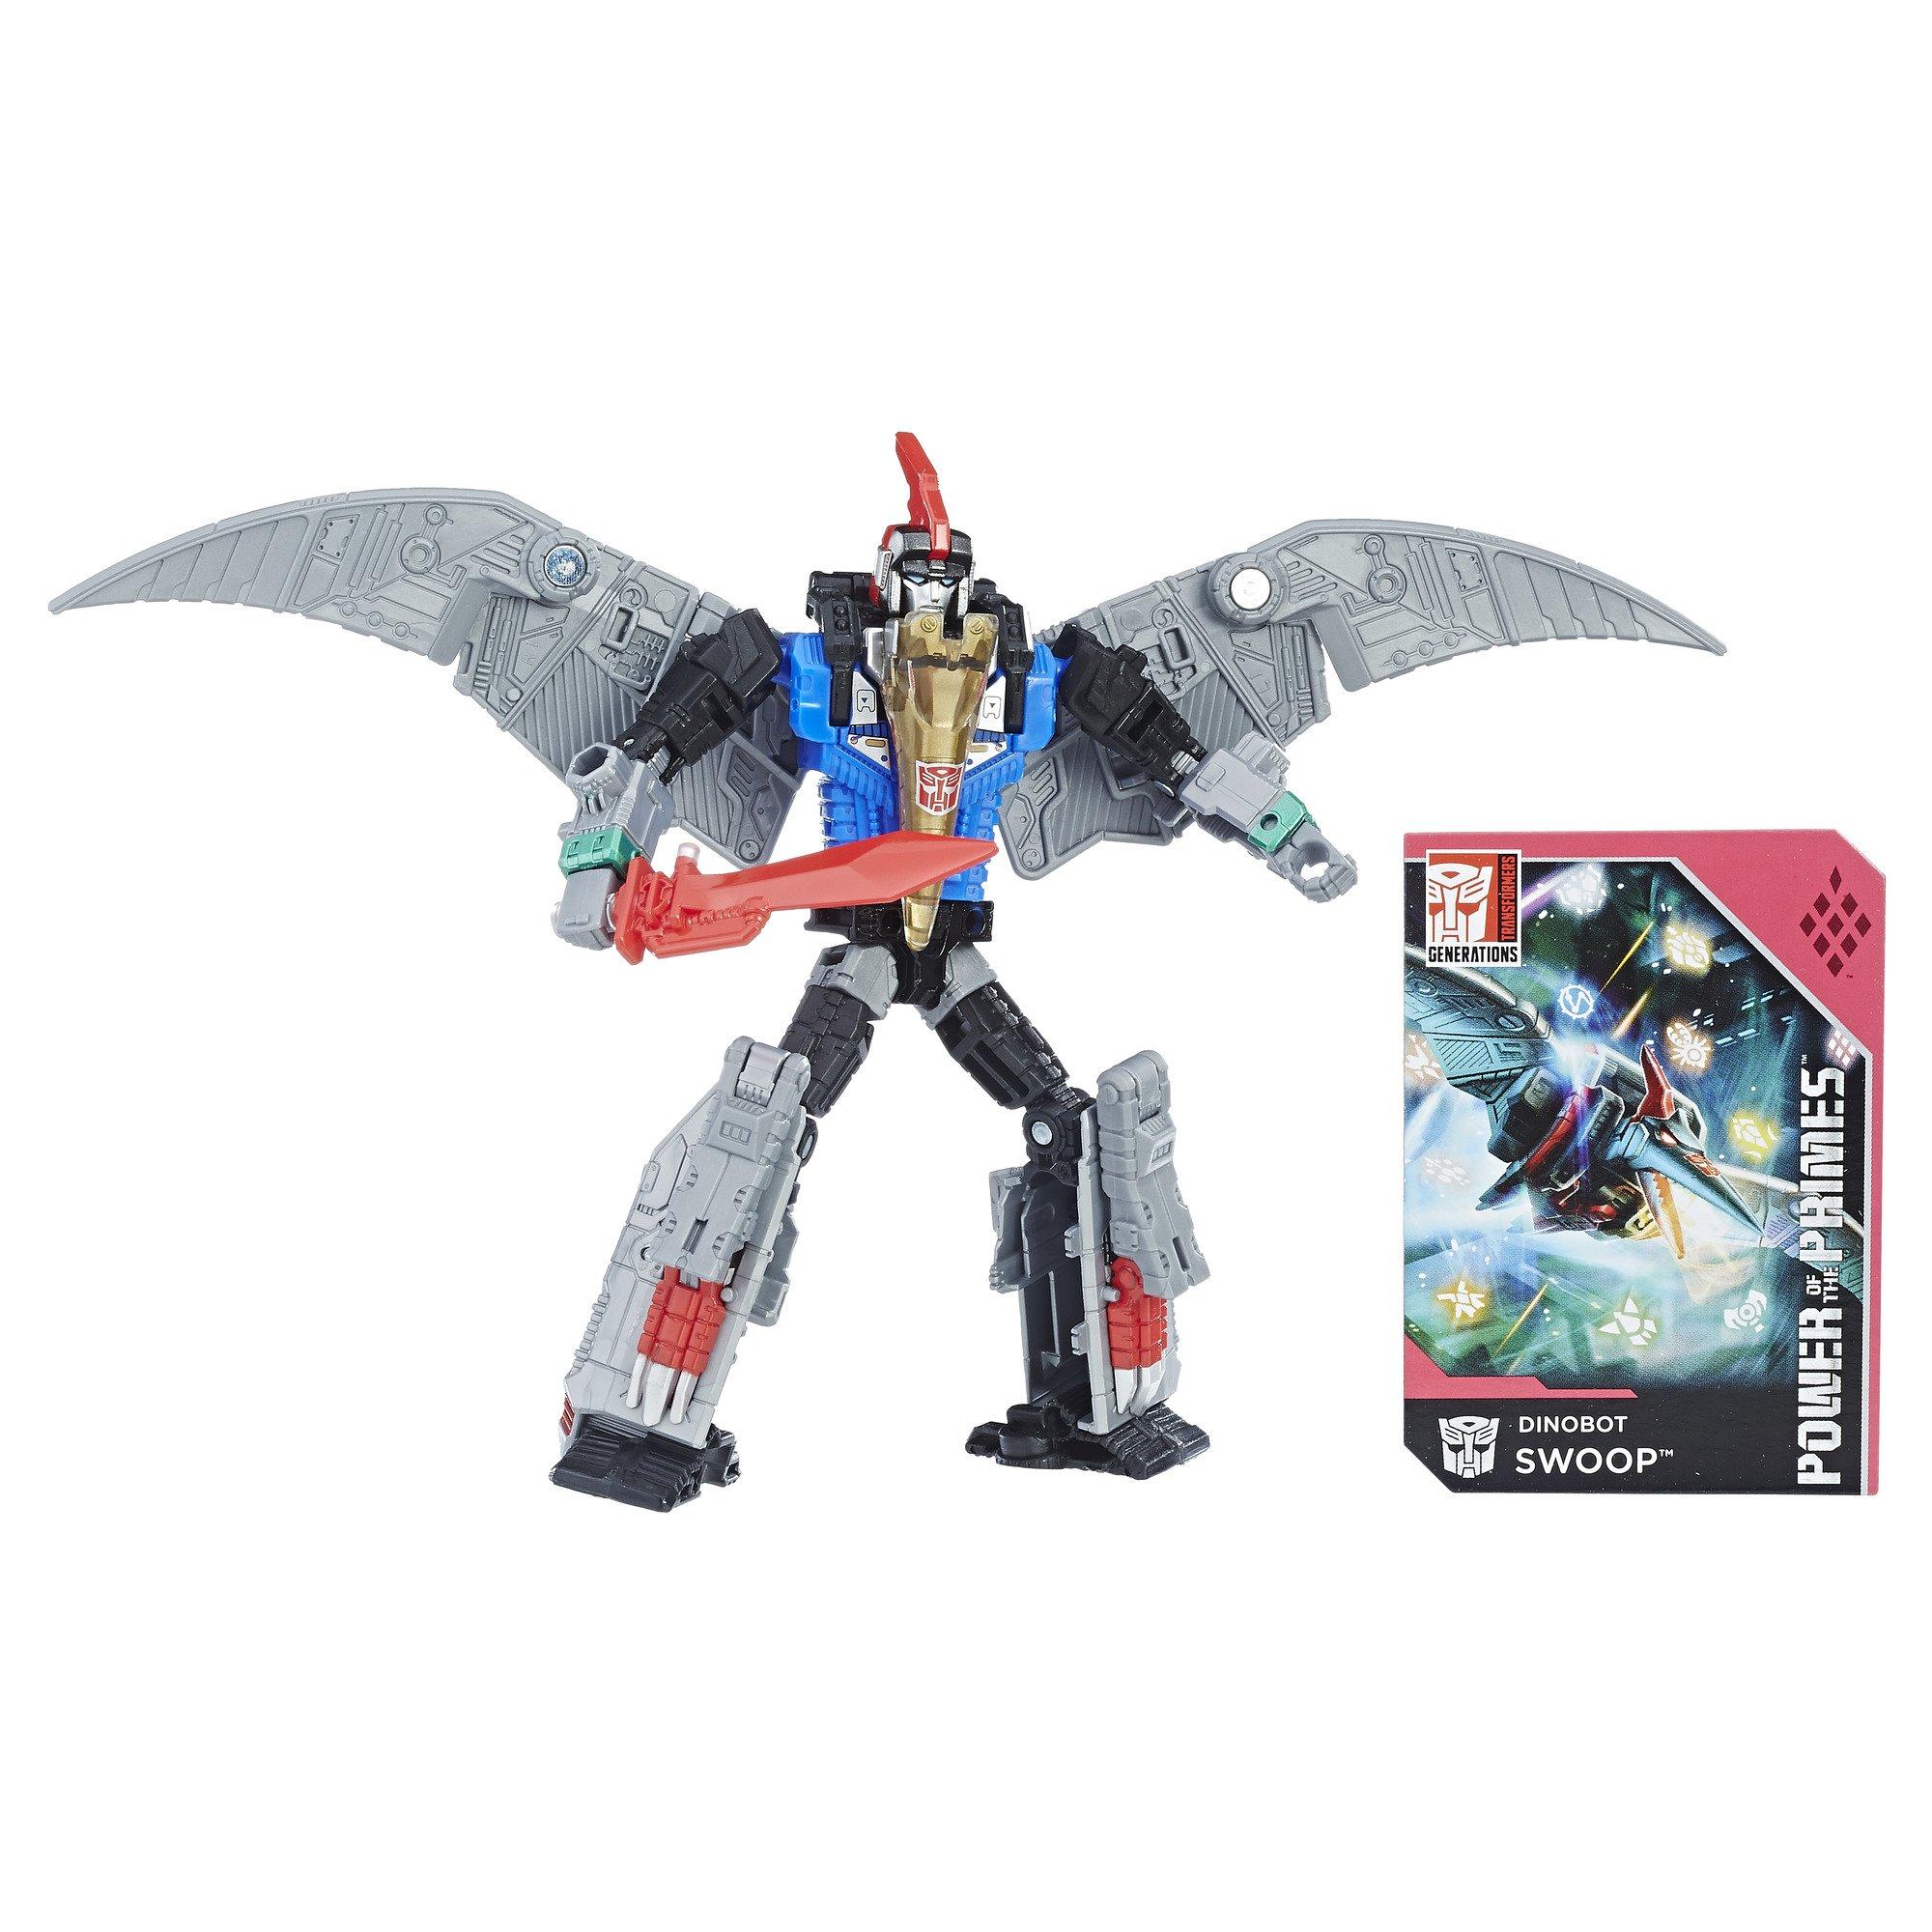 Transformers: Generations Power of the Primes Deluxe Class Dinobot Swoop